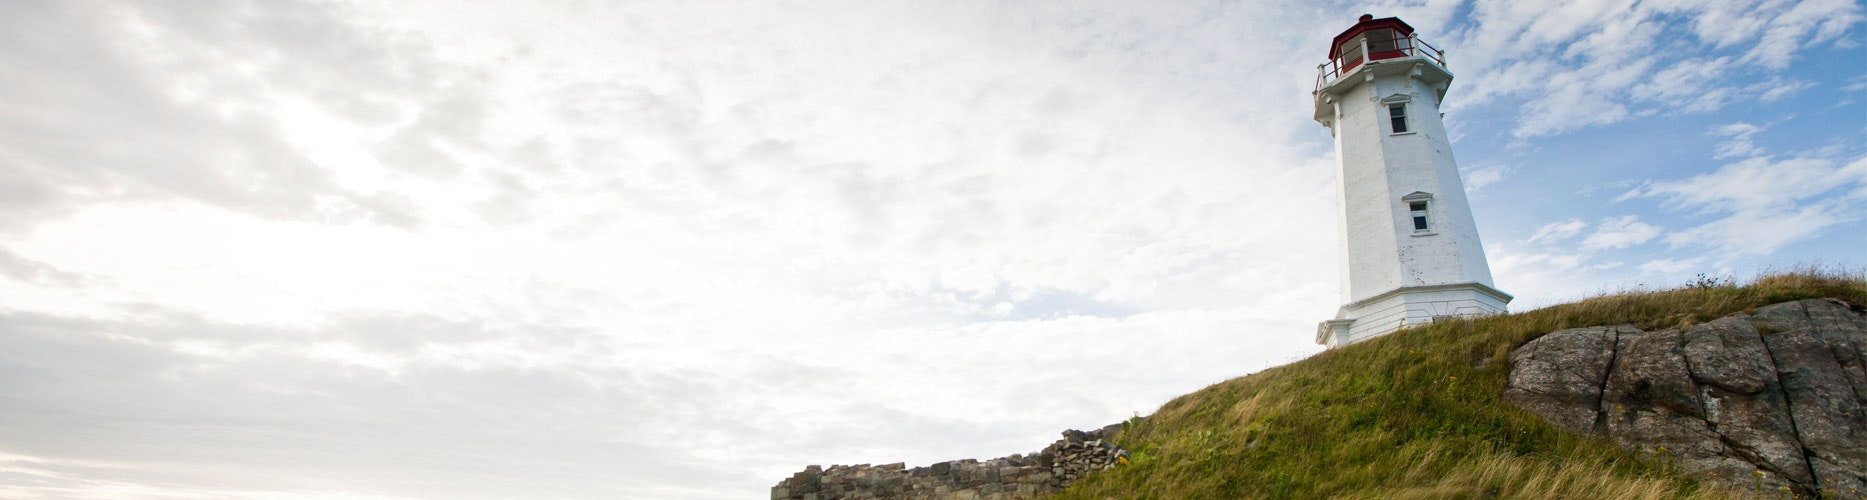 Nova Scotia Spezial Panorama